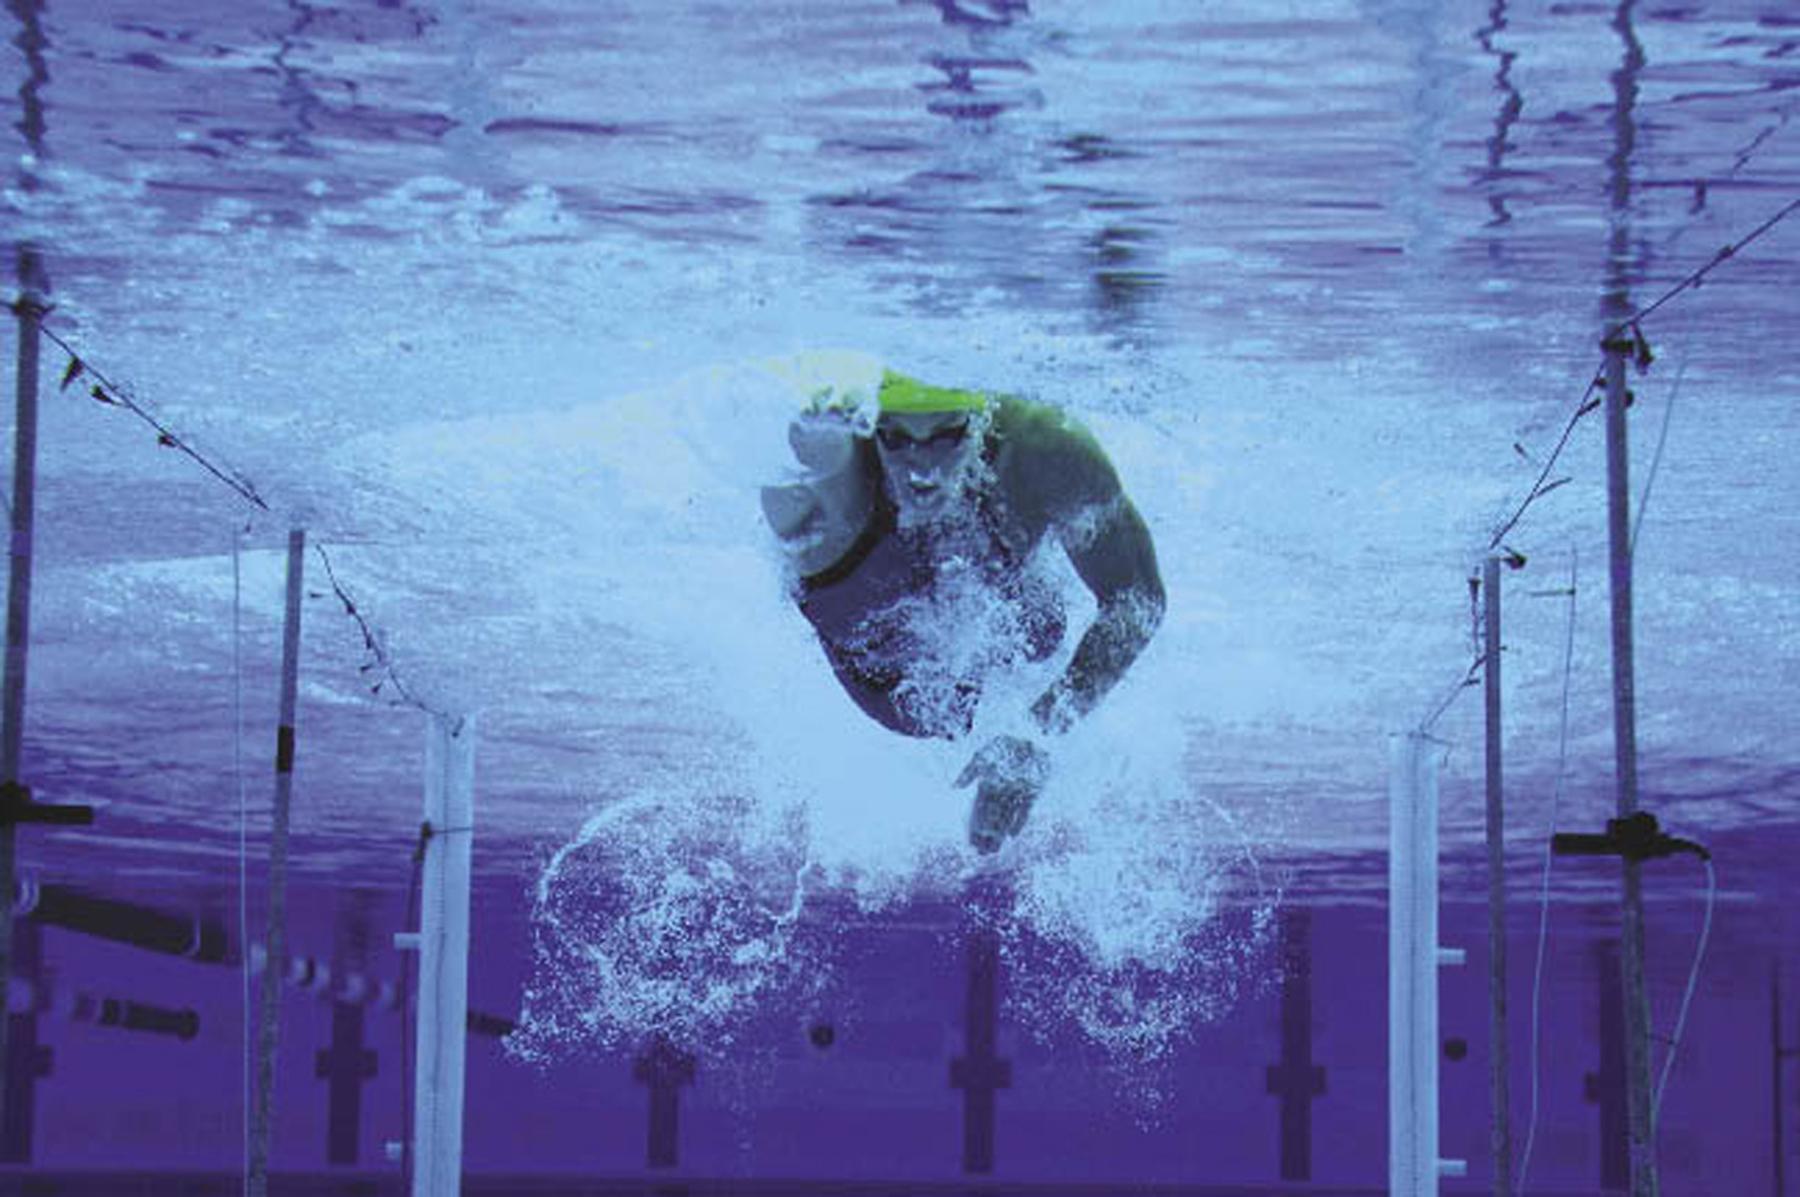 An athlete swims toward the camera.